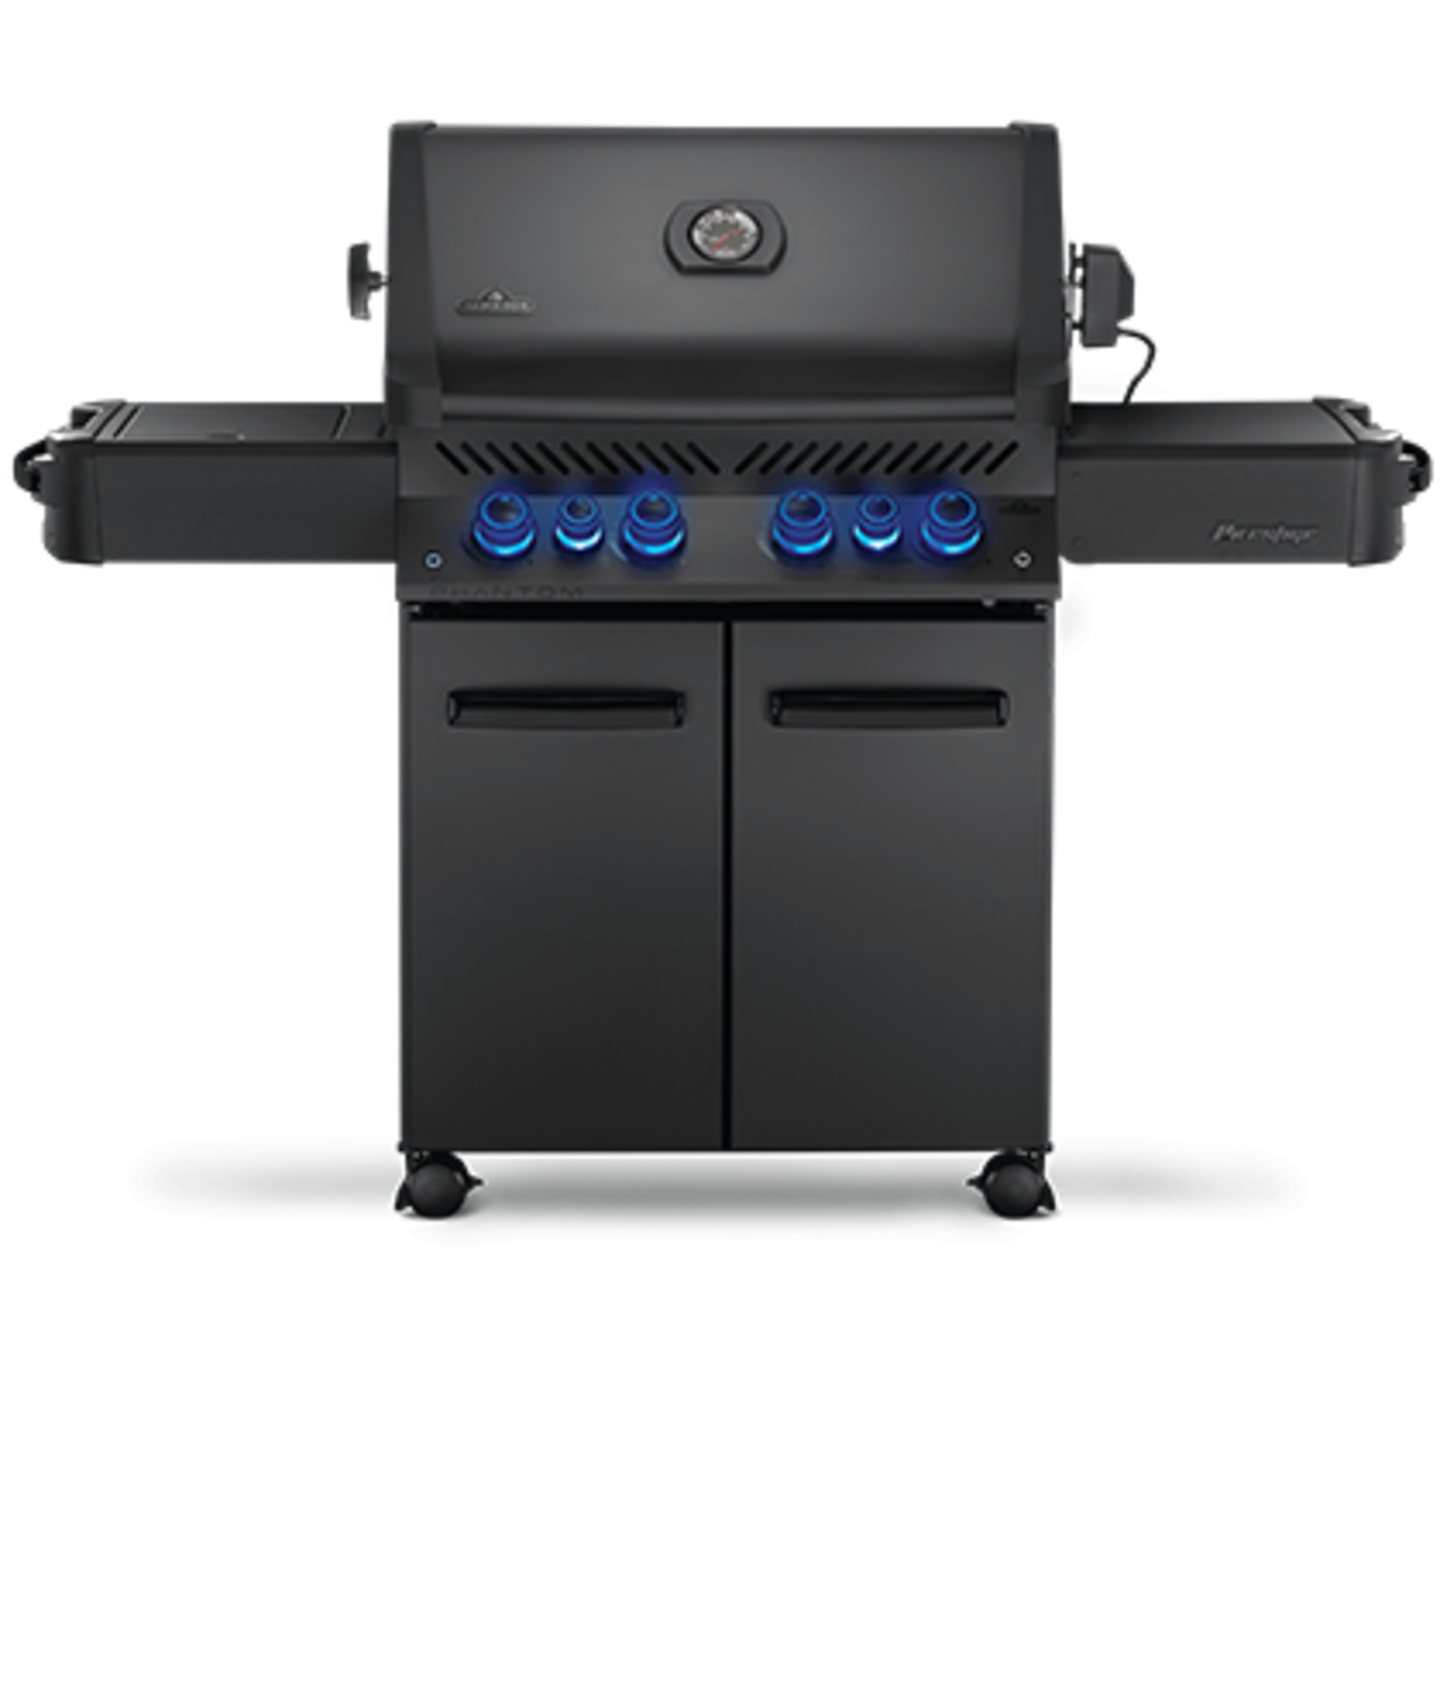 Napoleon Grills Limited Edition Phantom Prestige P500RSIB